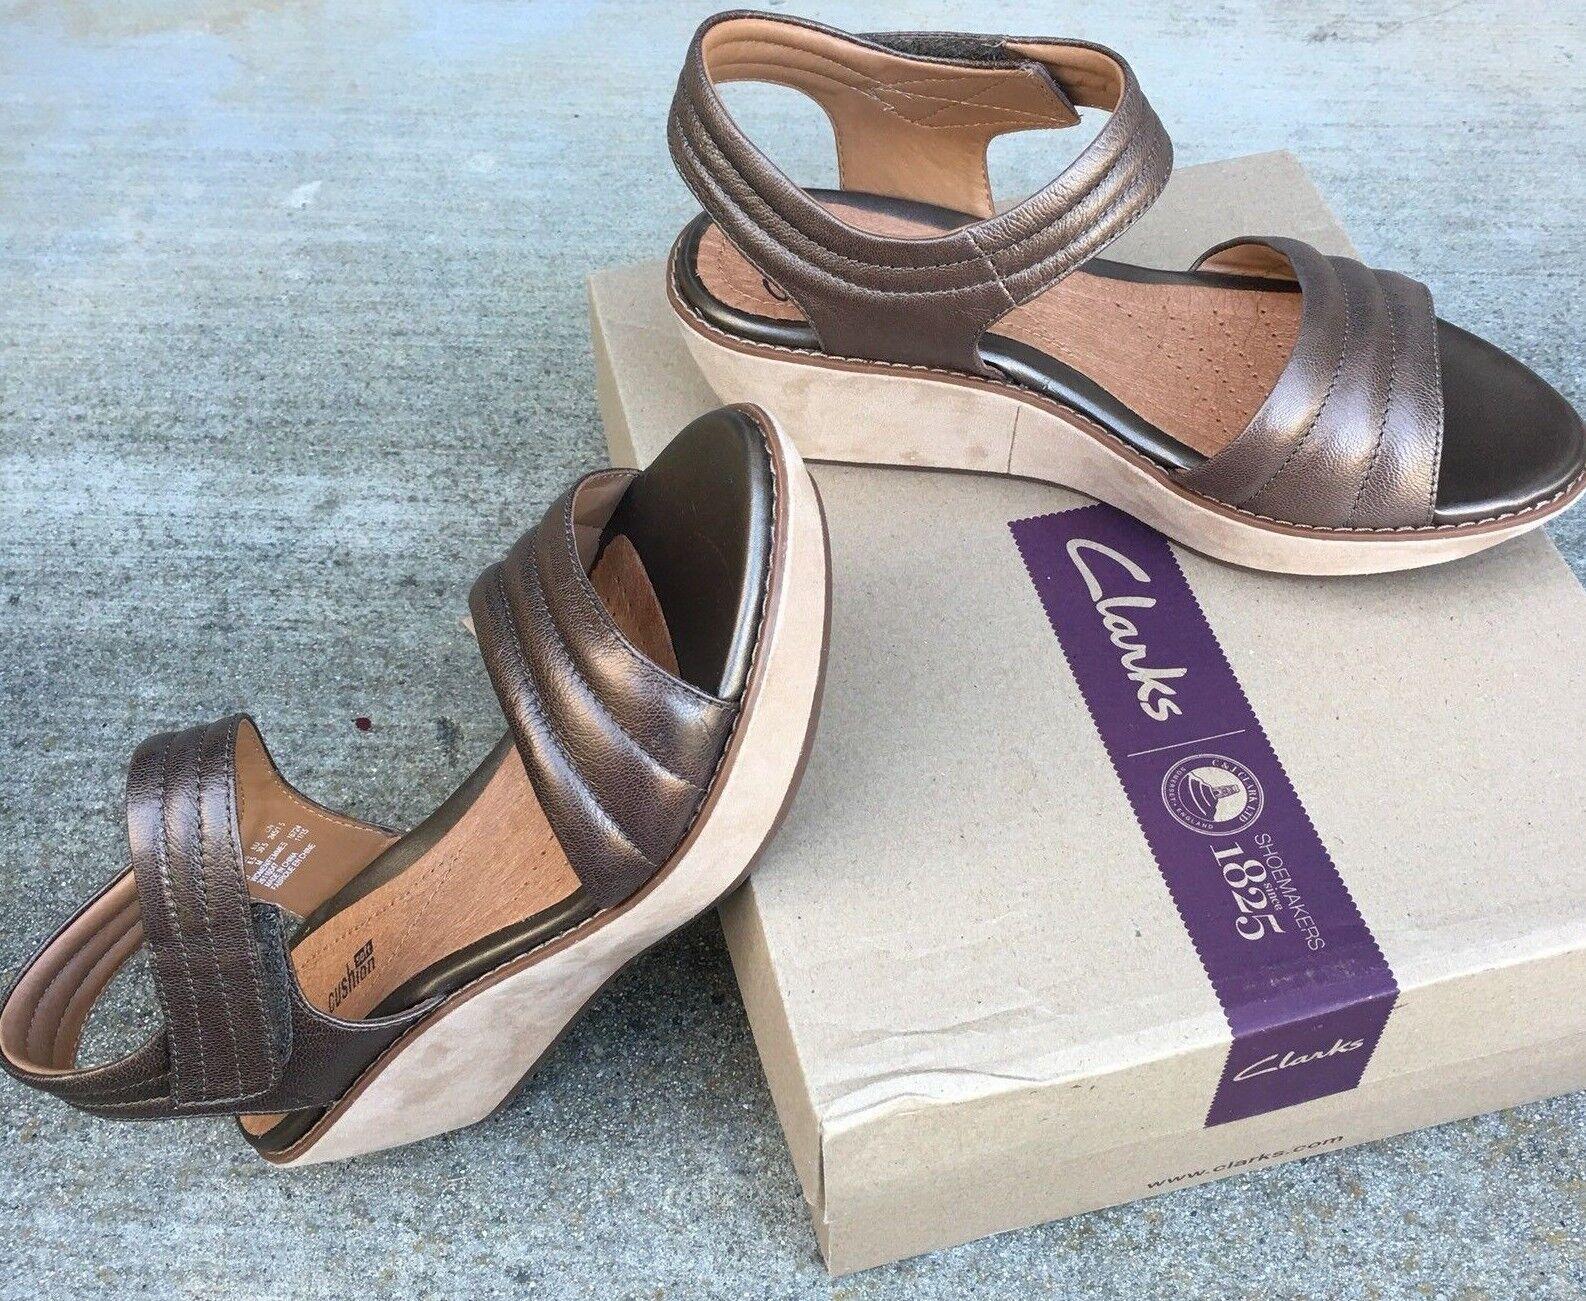 Clarks Hazelle Alba Damens Pewter Leathr Wedge Ankle Strap Platform Sandale Sz 9.5